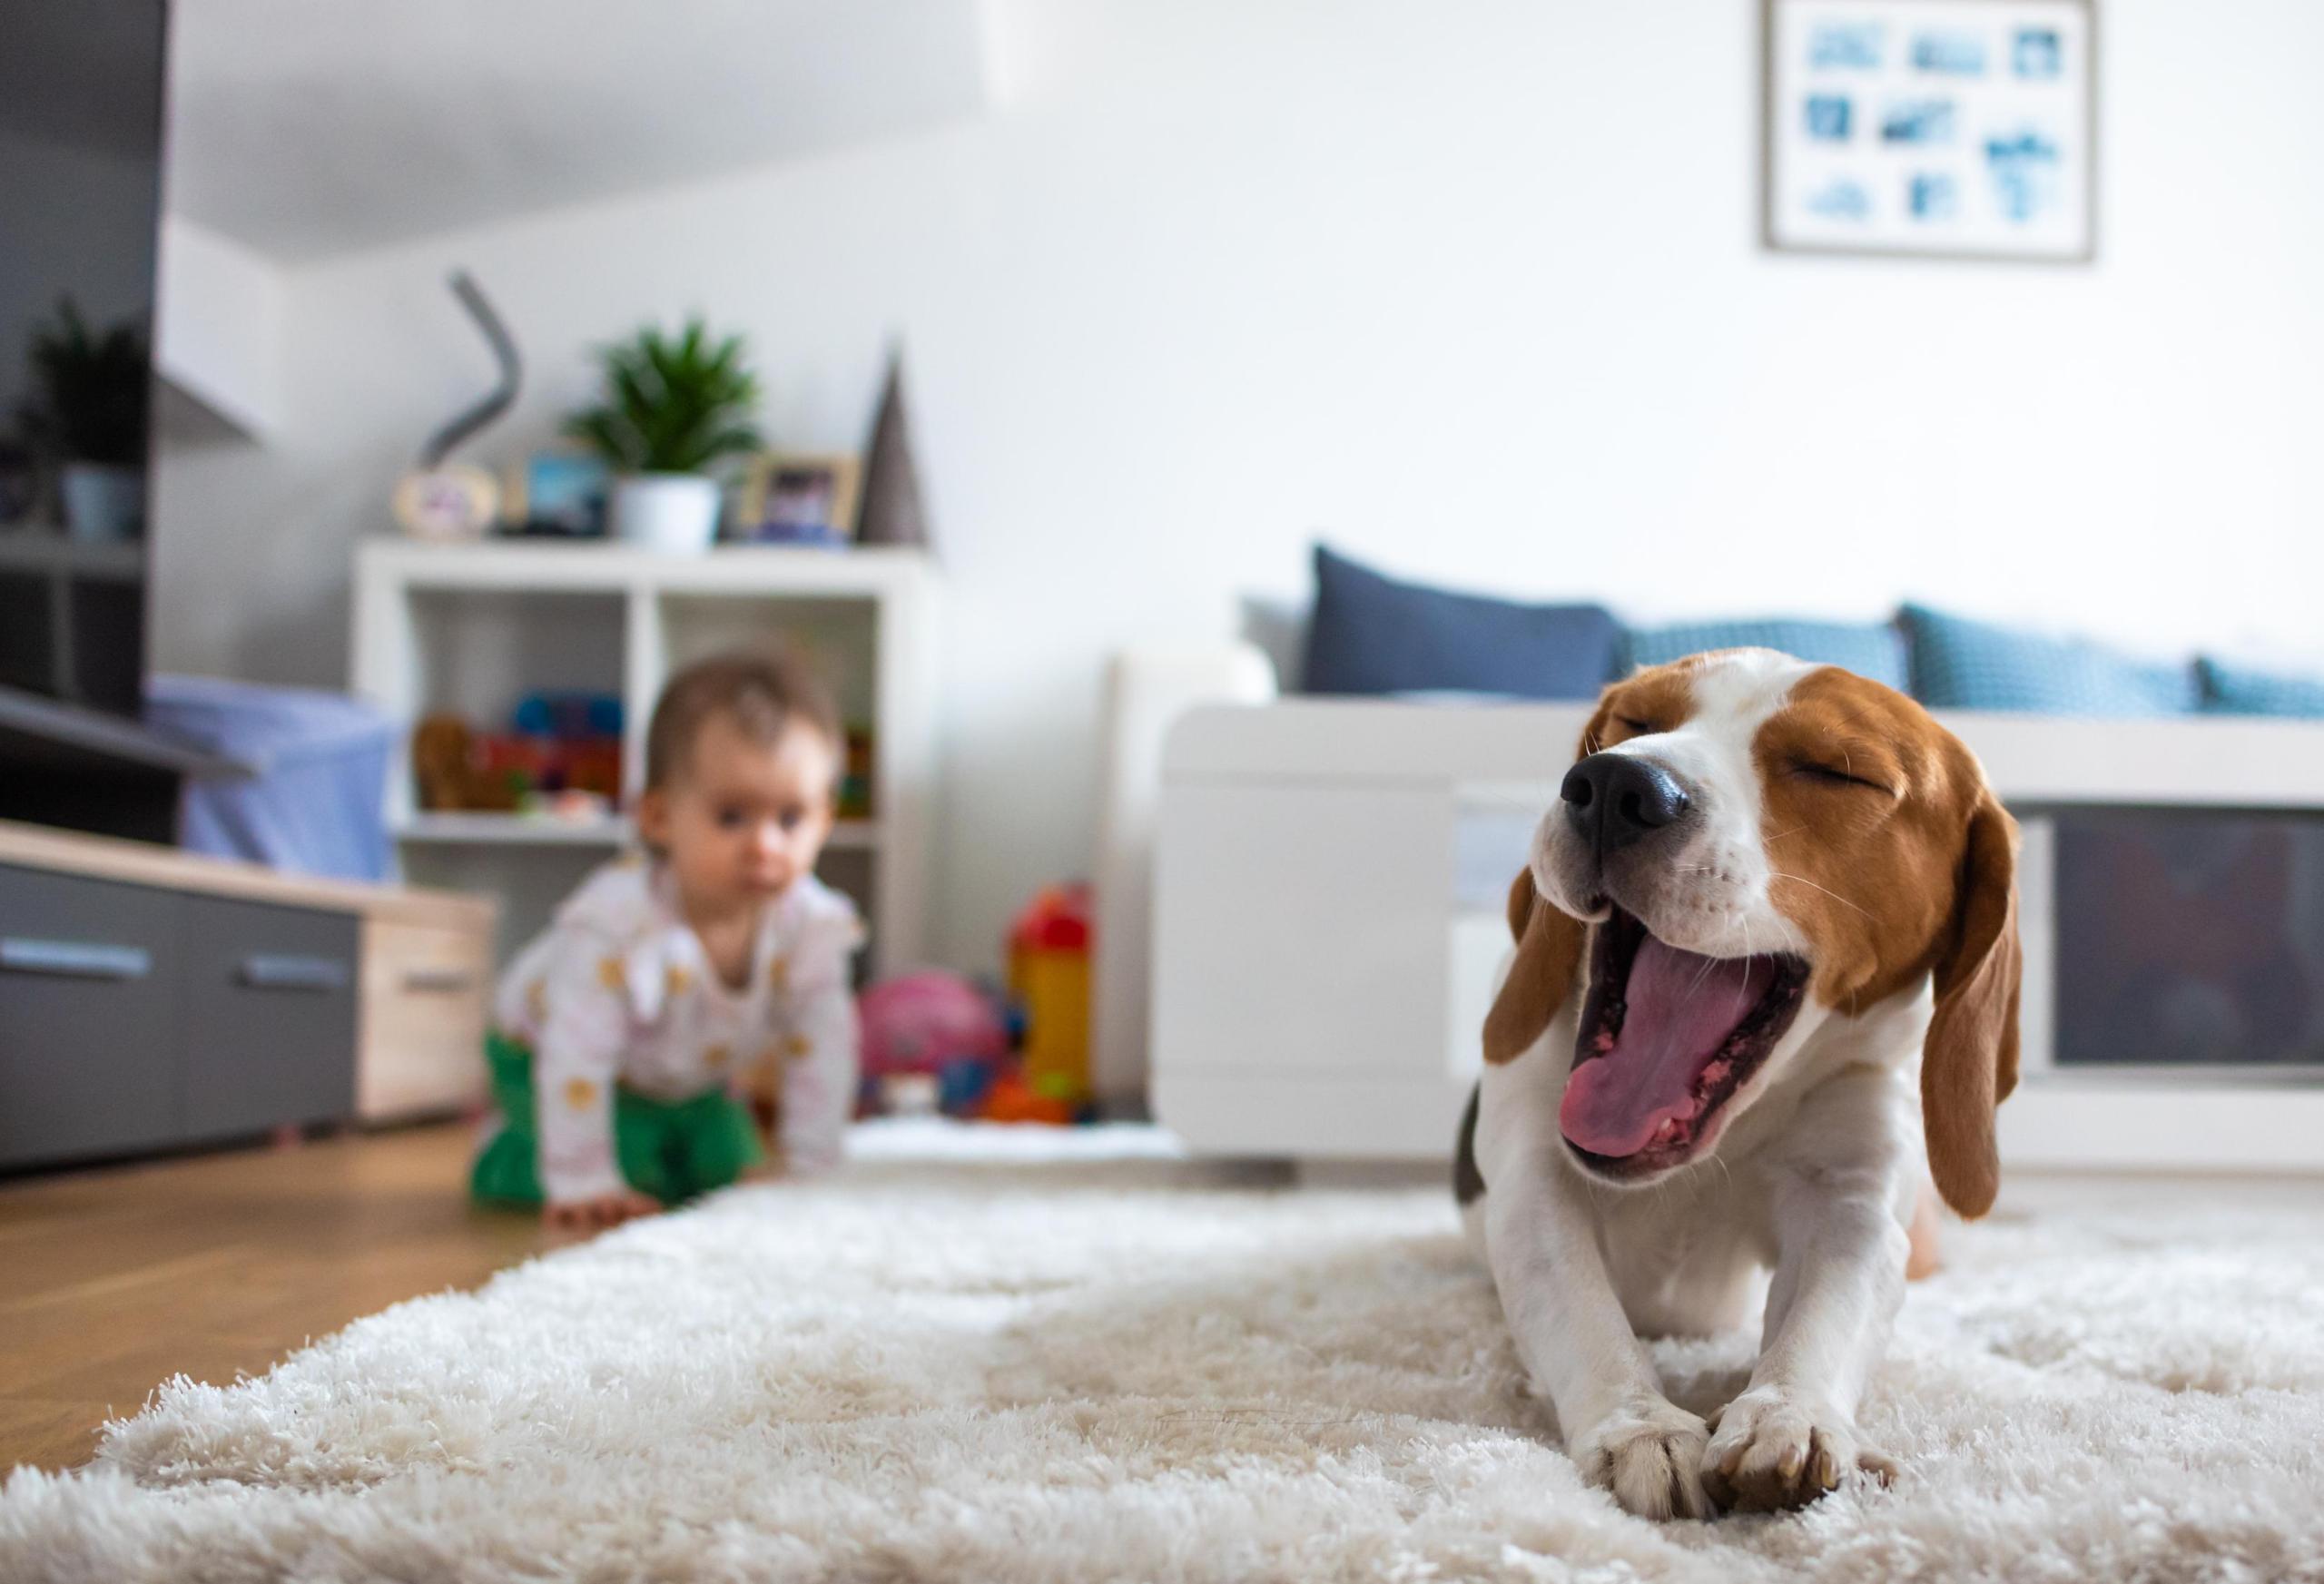 baby chasing dog